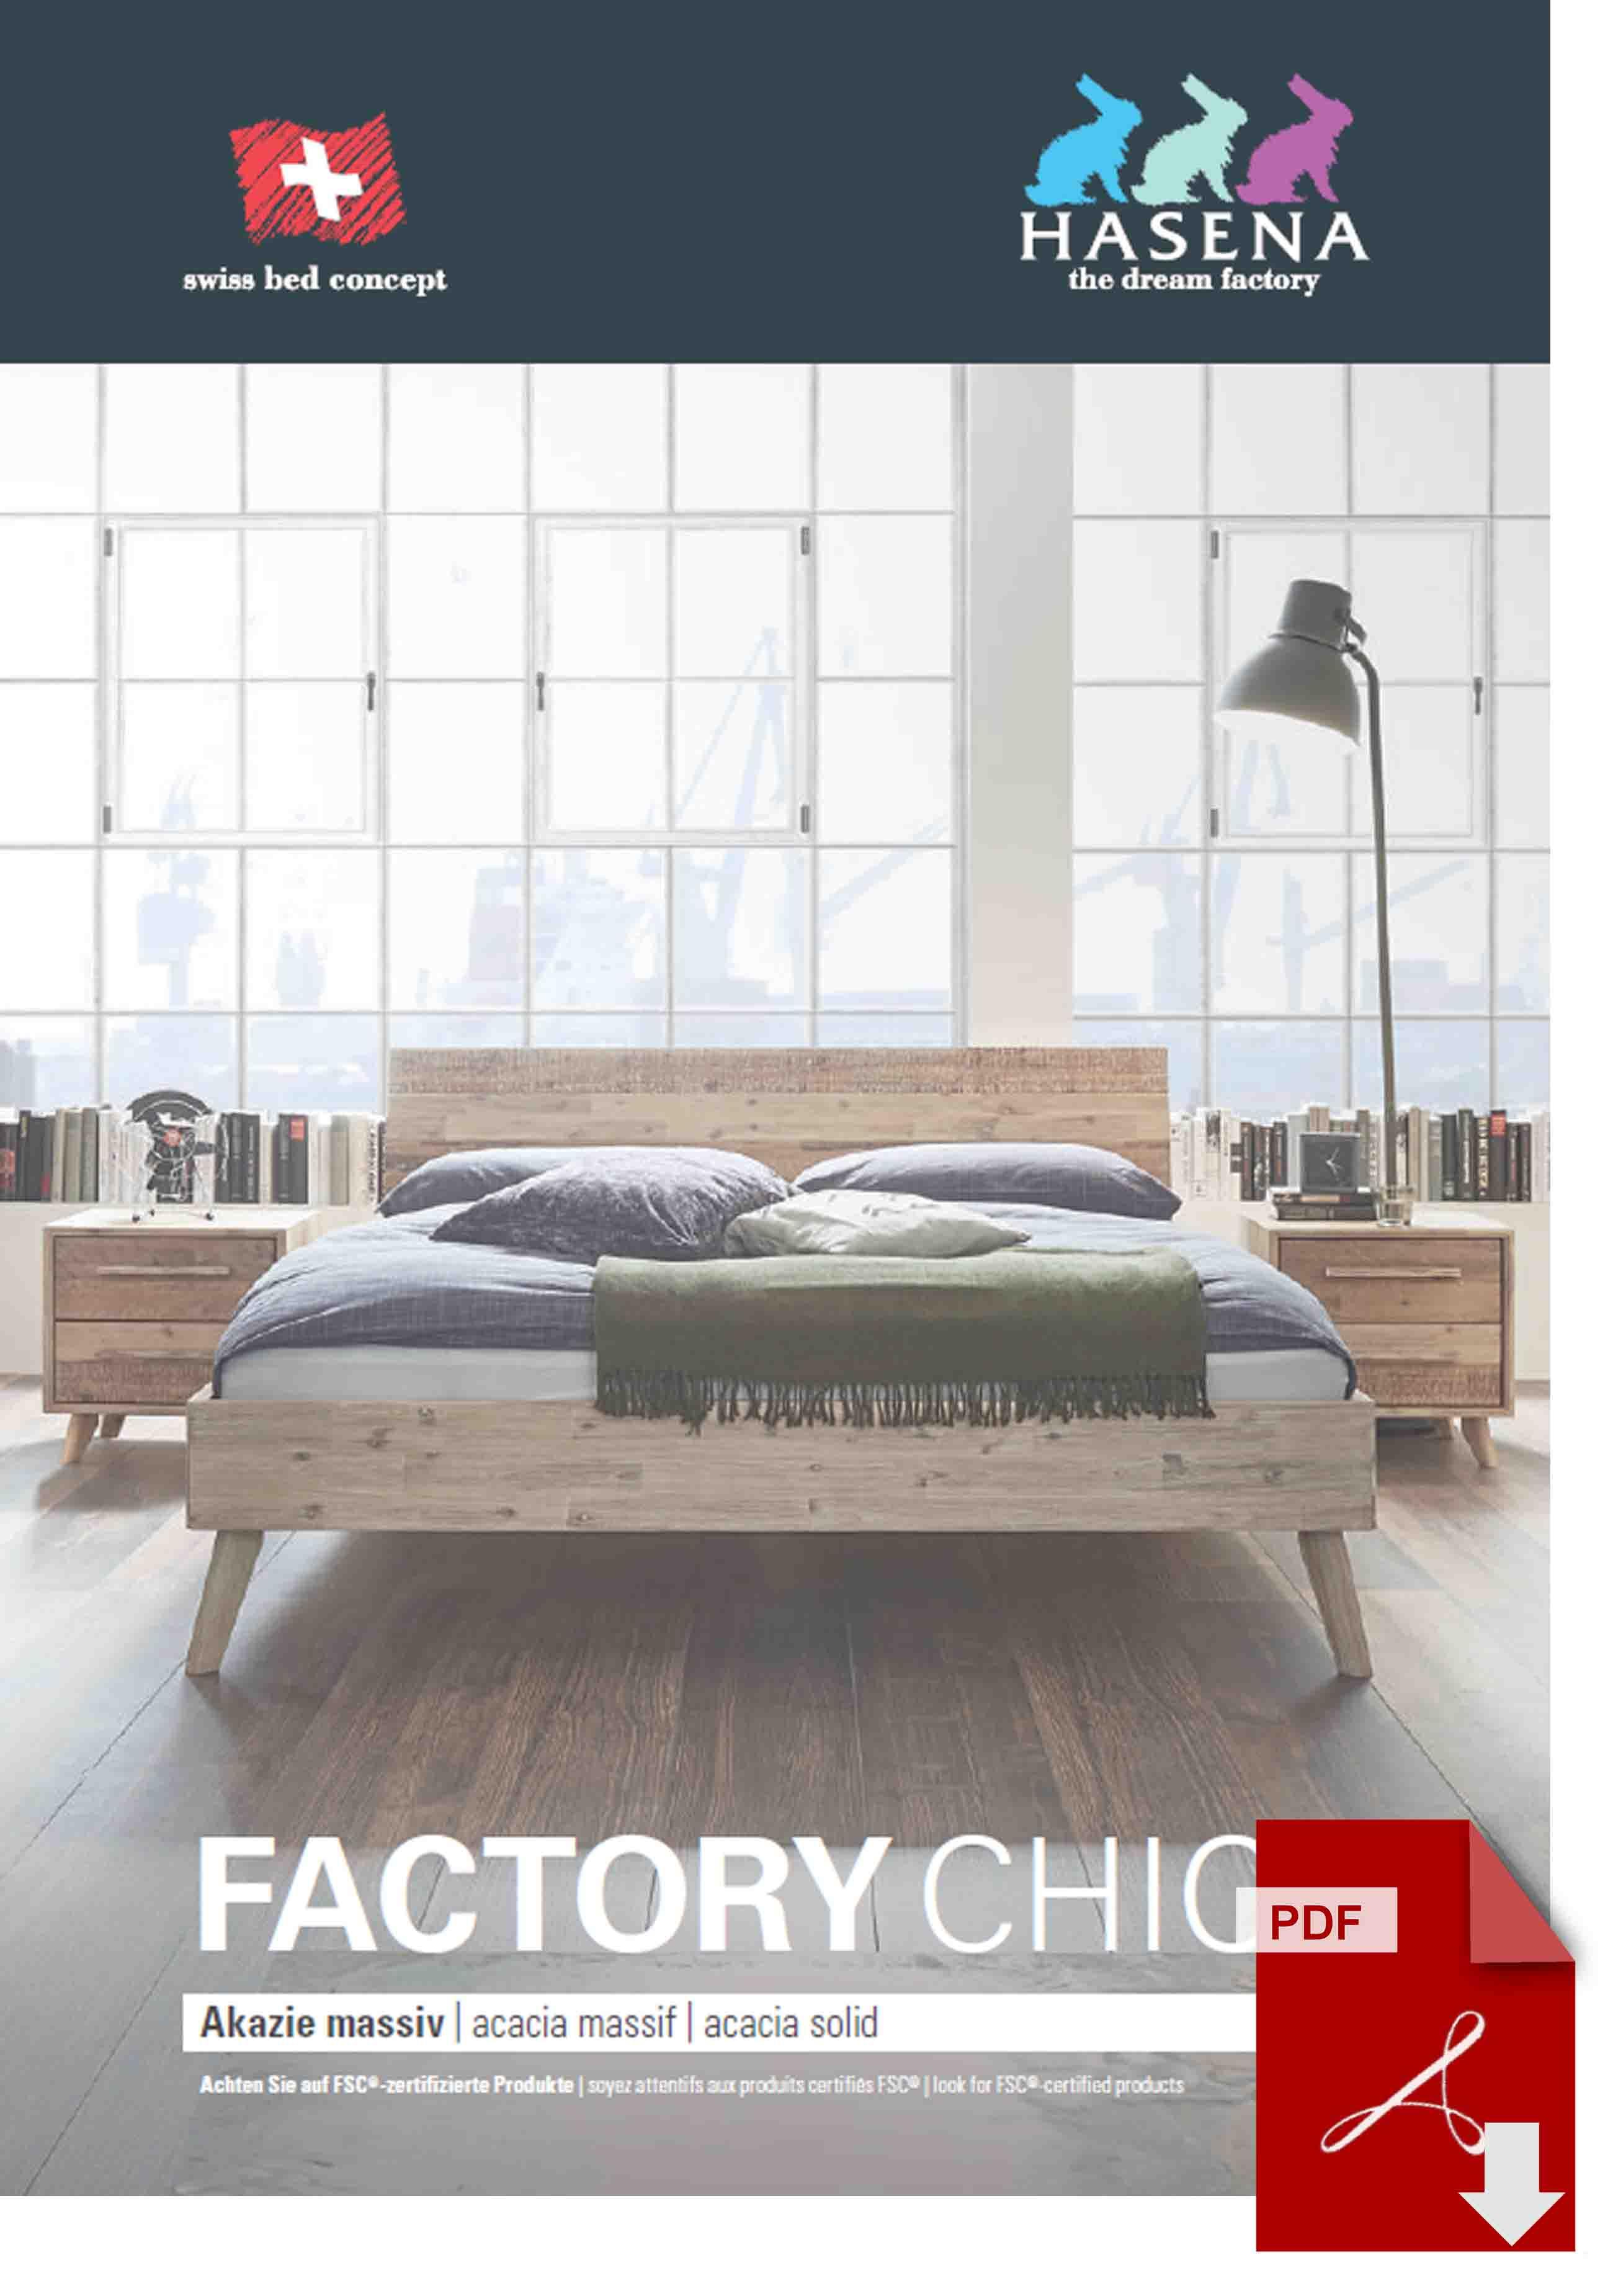 Hasena Factory Chic Katalog als PDF Datei